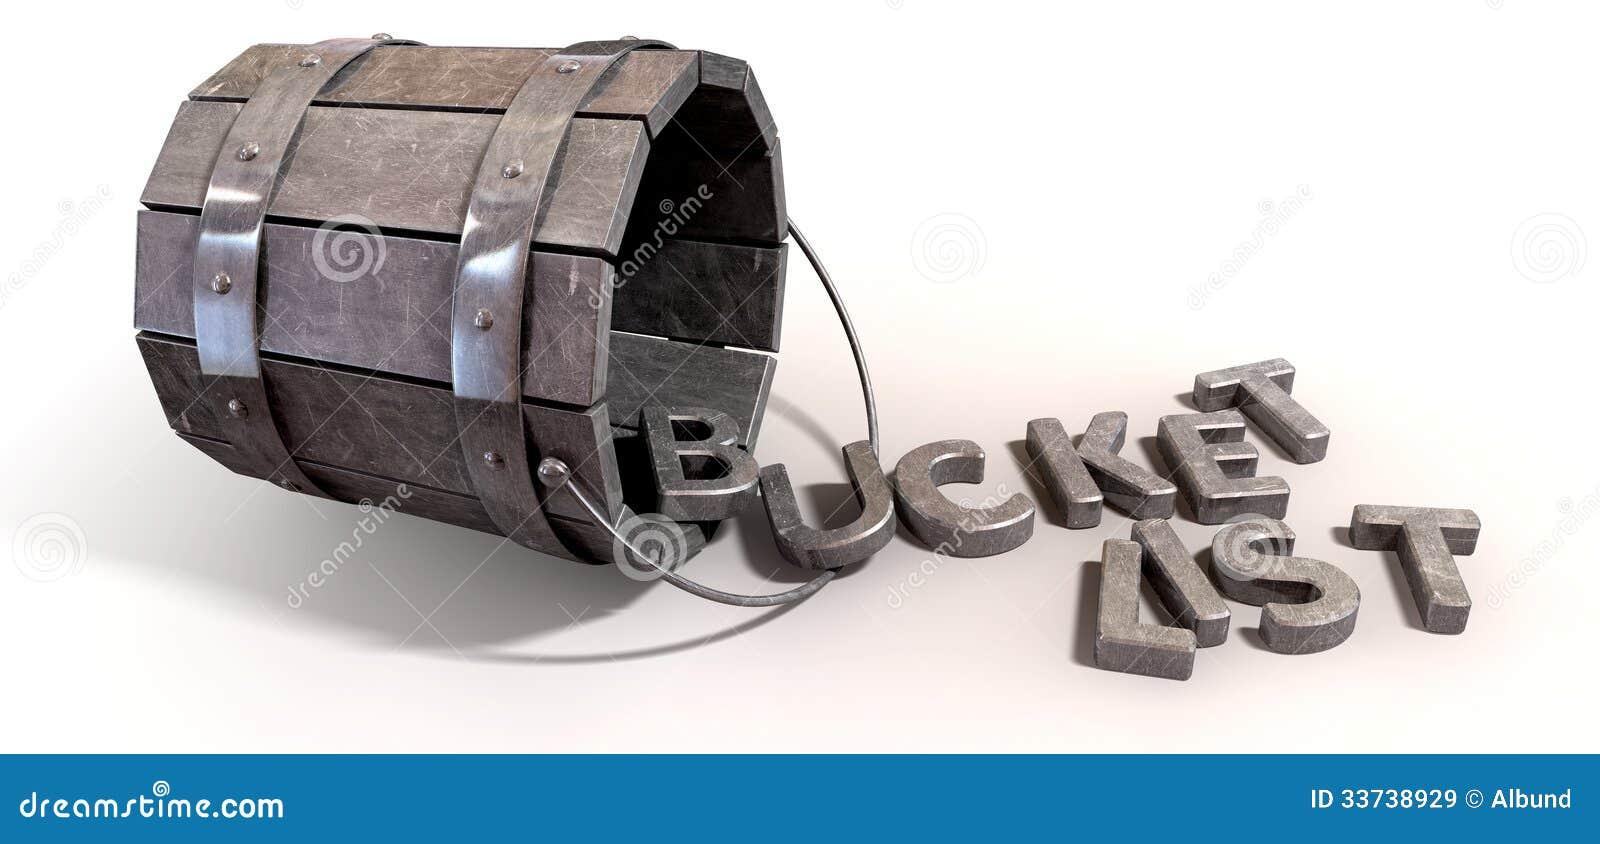 Str8 Stockbroker Bucket List Wish